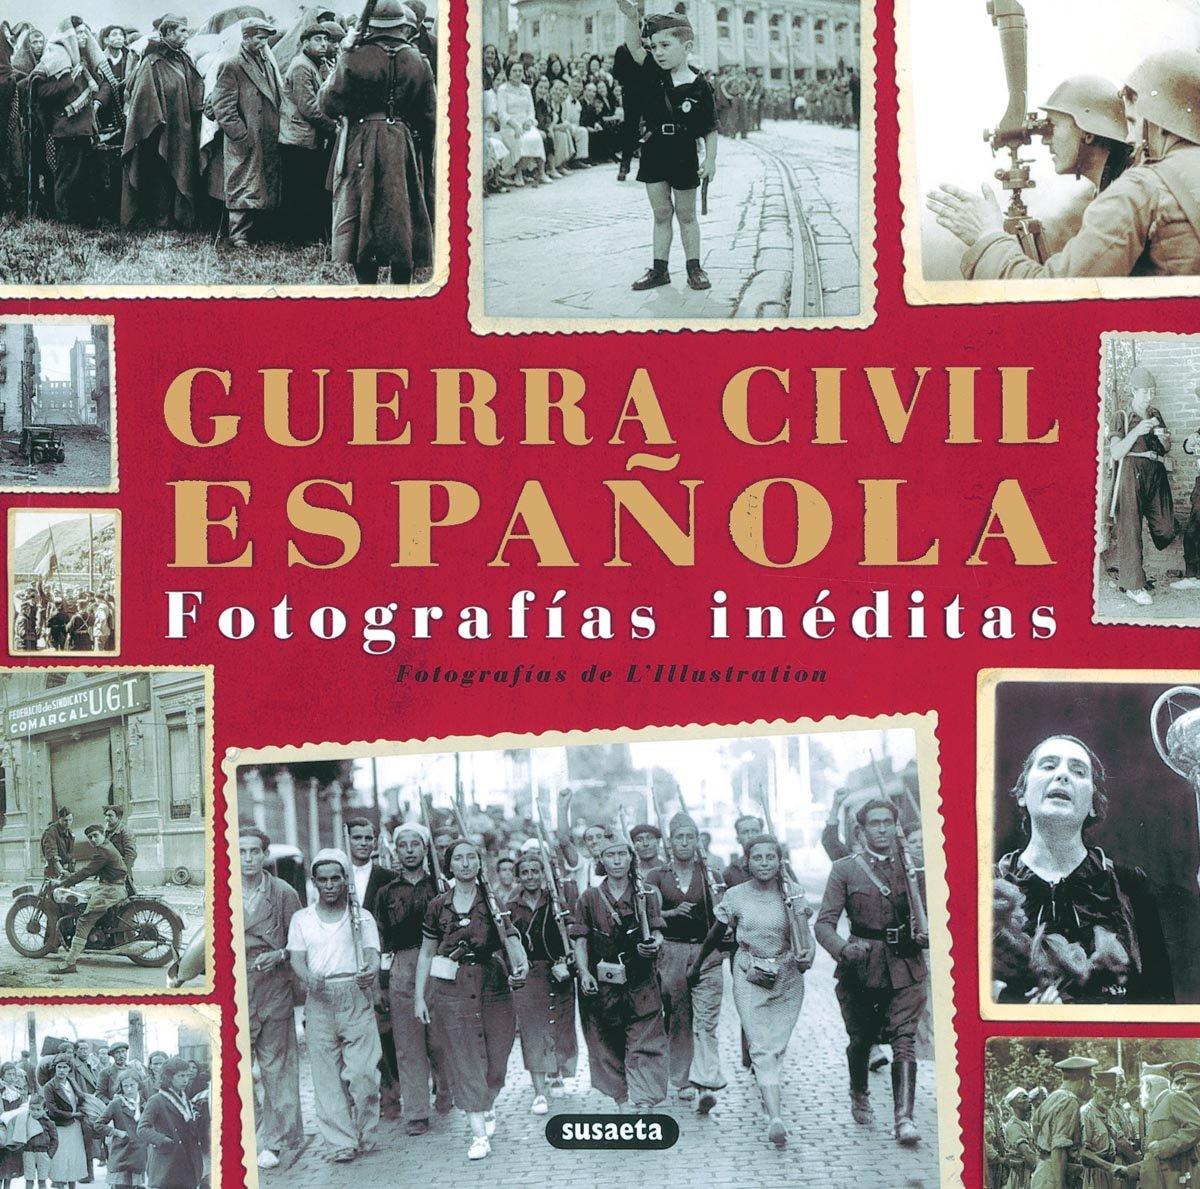 Guerra Civil Española.Fotografias Ineditas: Amazon.es: Susaeta, Equipo, Susaeta, Equipo: Libros